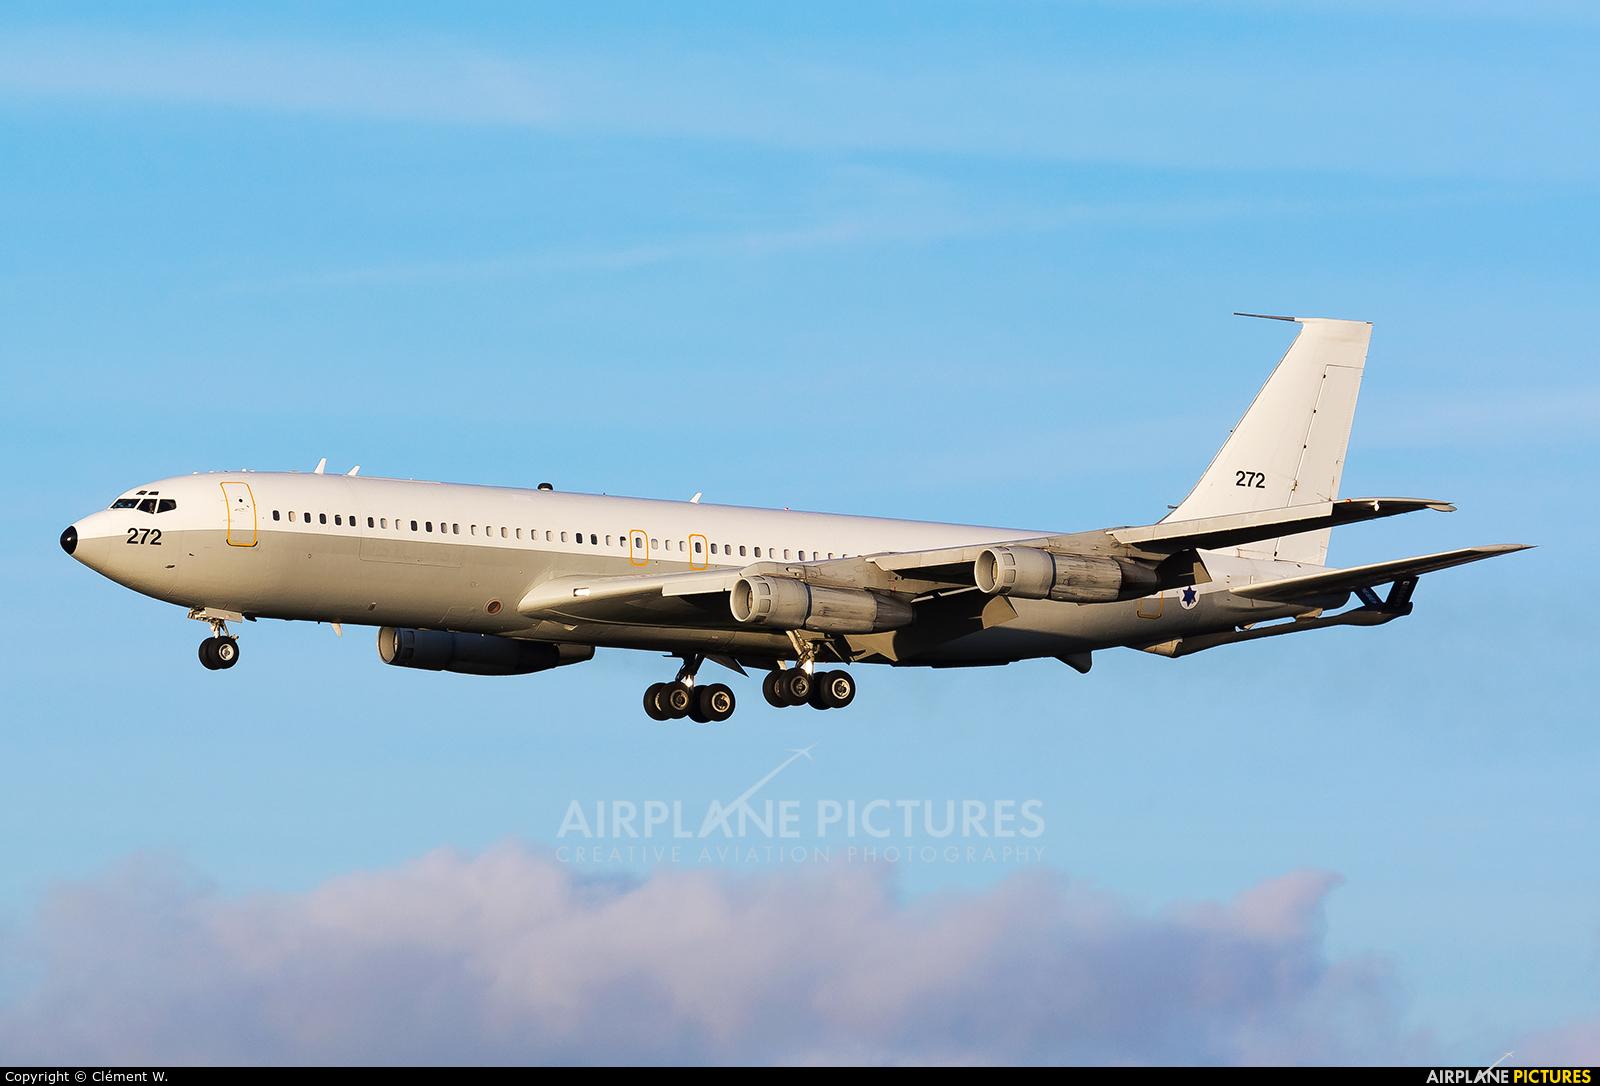 Israel - Defence Force 272 aircraft at Paris - Orly